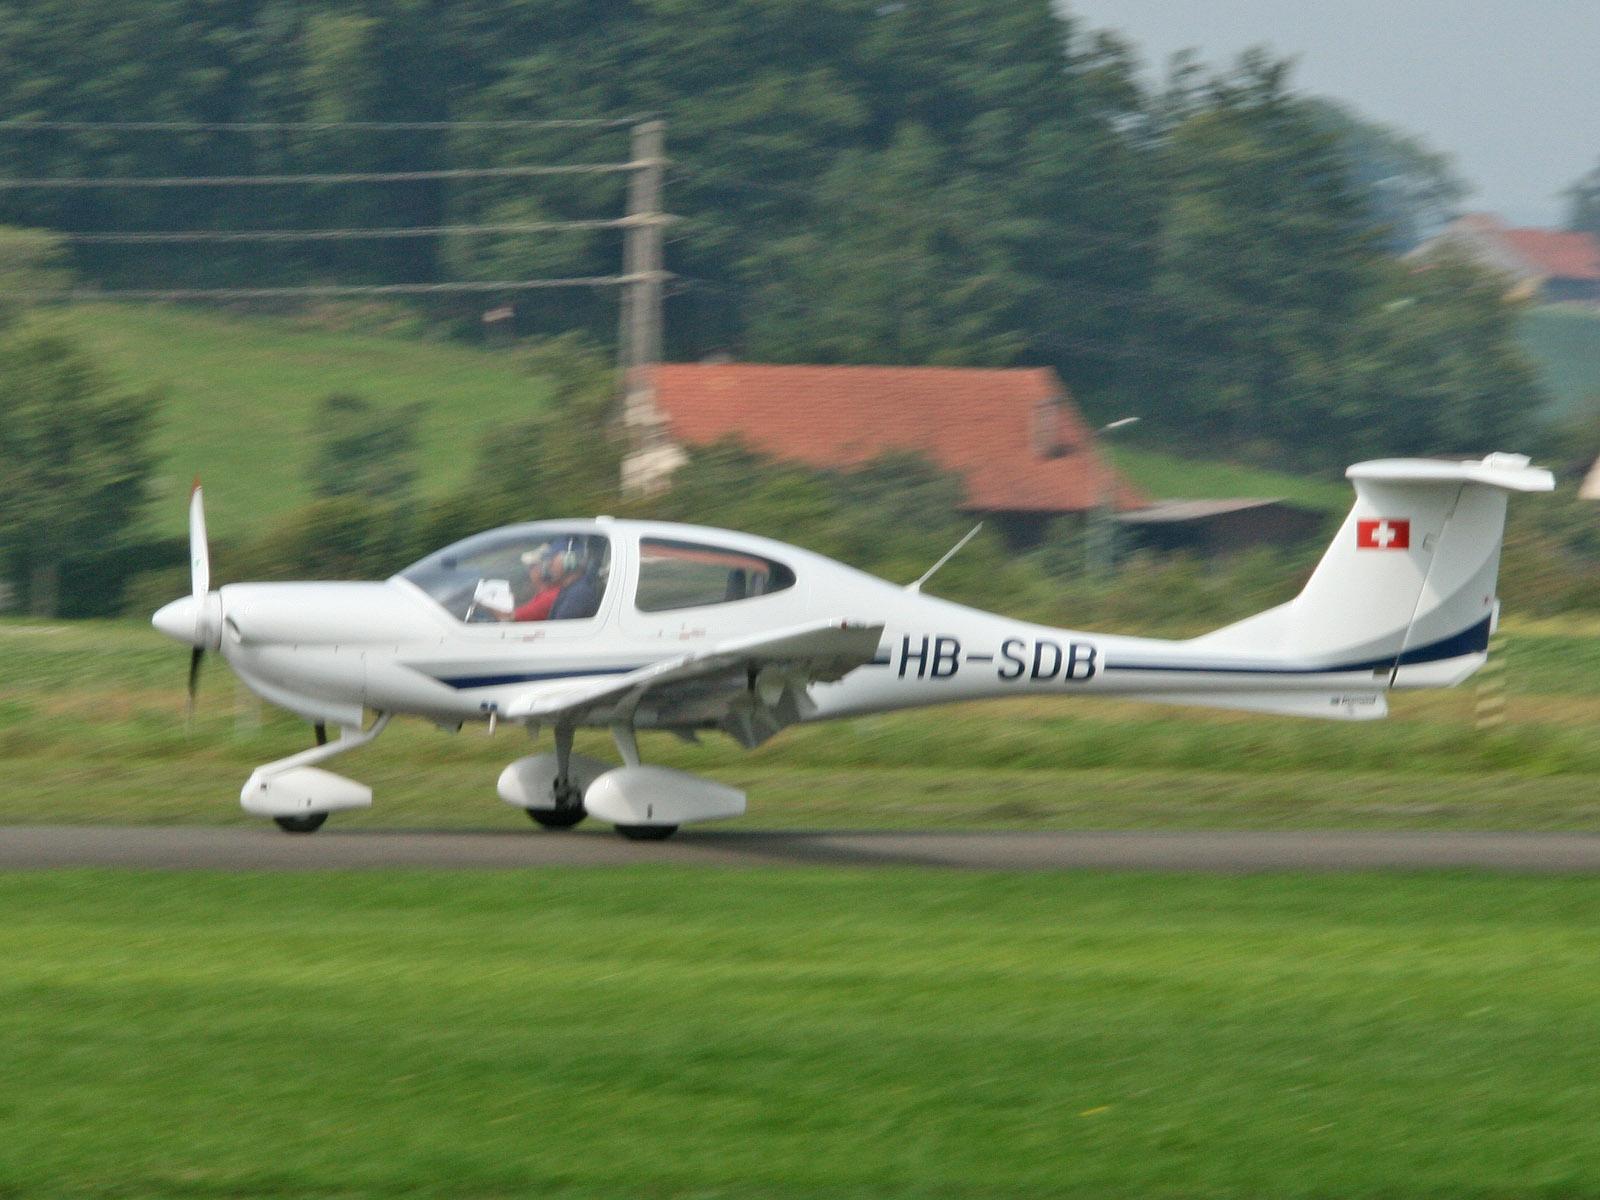 Militär Flugzeuge - Kategorie: Propeller - Bild: Diamond Star DA 40 ...